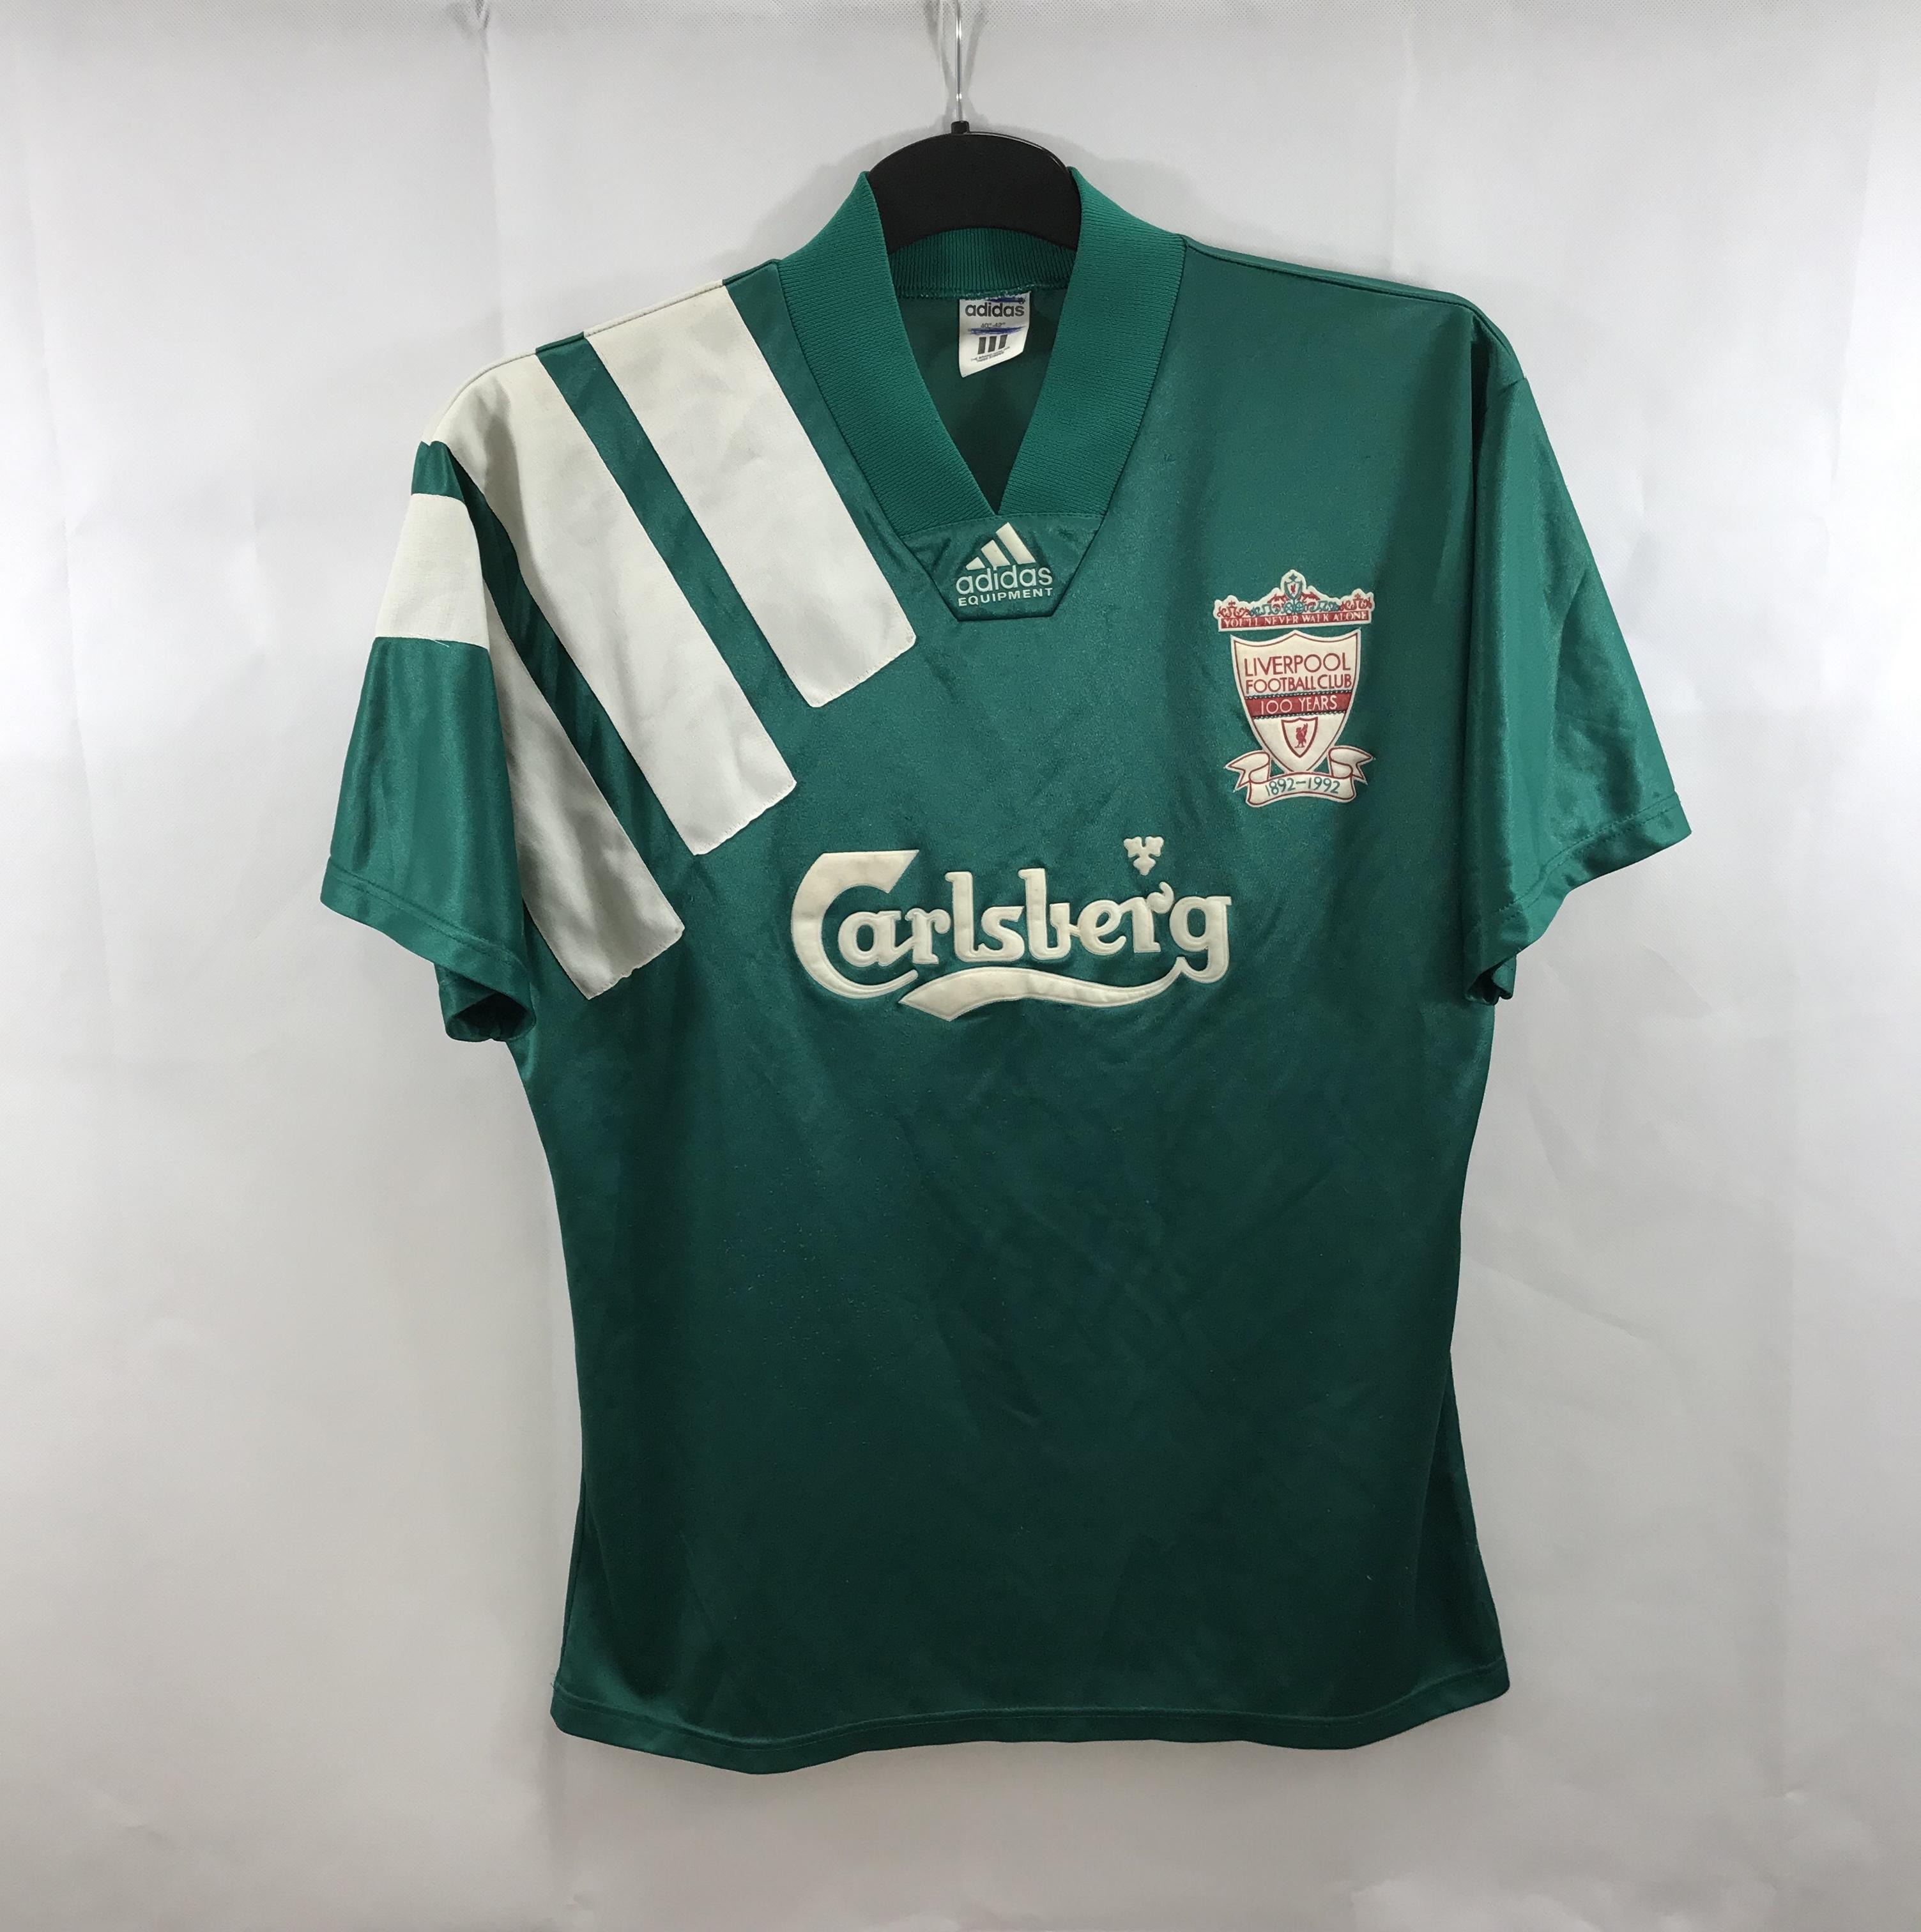 Liverpool Centenary Away Football Shirt 199293 Adults MediumLarge Adidas